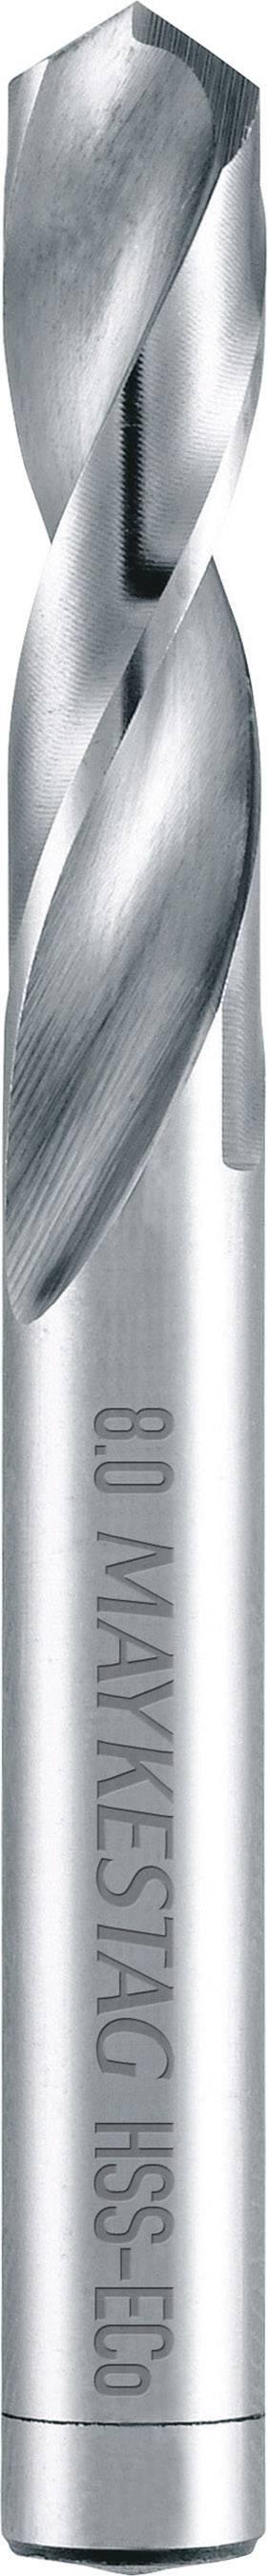 Kovový spirálový vrták Alpen 92100300100, 3 mm, 46 mm, N/A, HSS-E, 1 ks